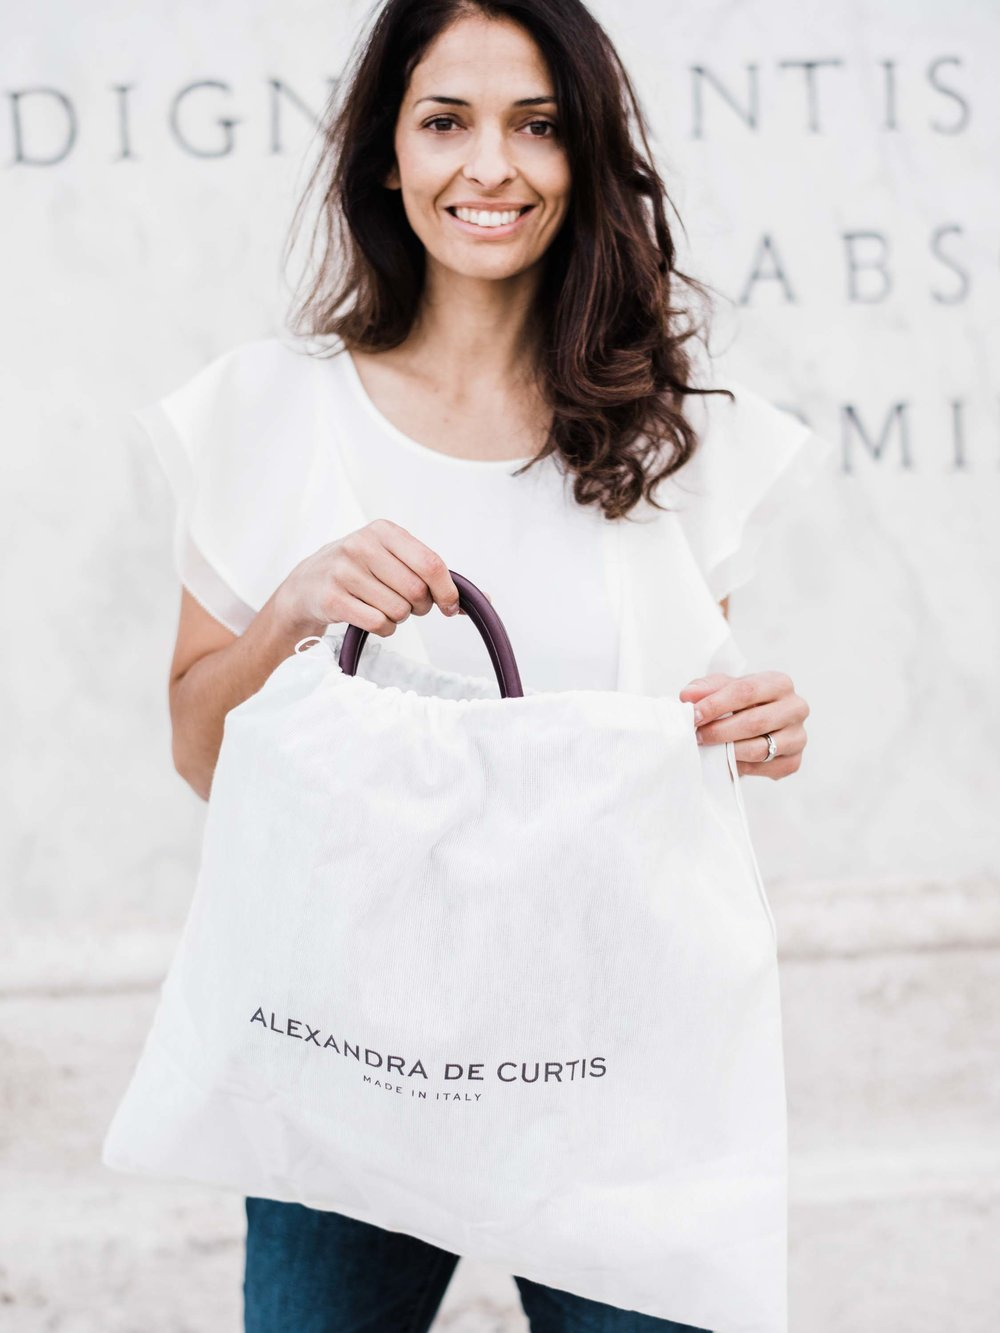 Alexandra de Curtis Luxury Italian Shoes Handbags